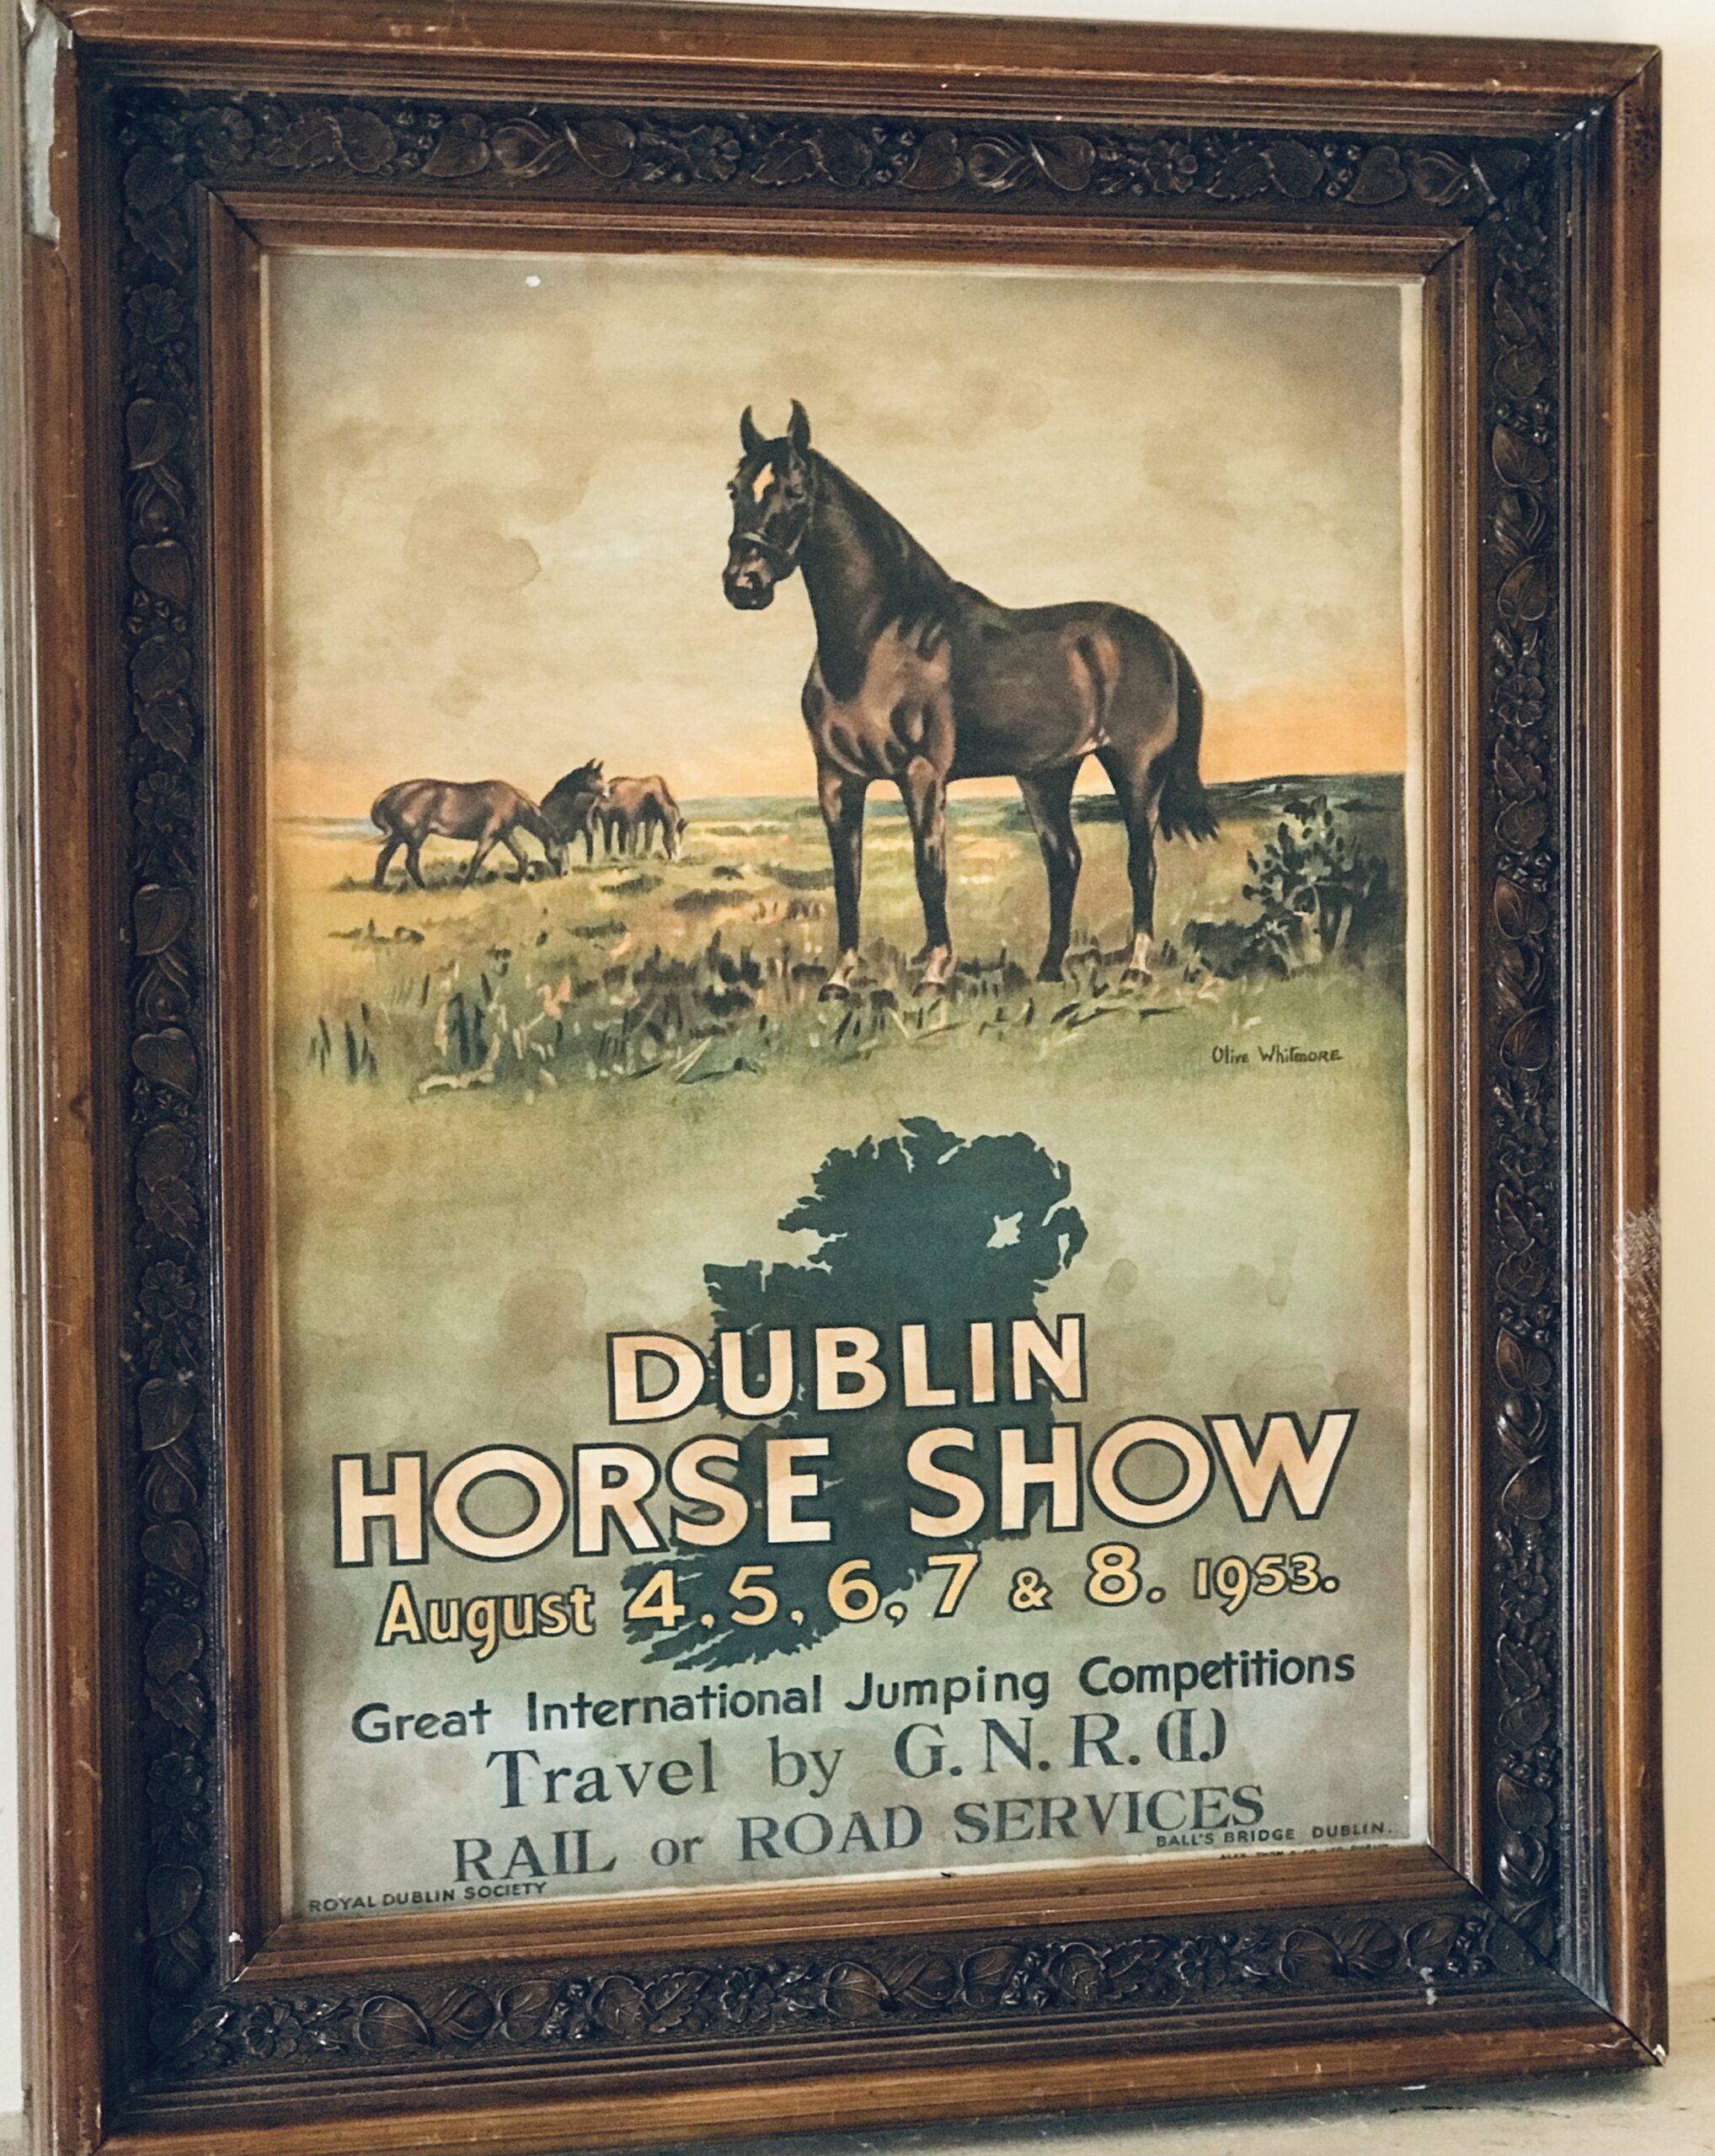 1953 RDS Dublin Horse Show Advertising Poster | The Irish ...